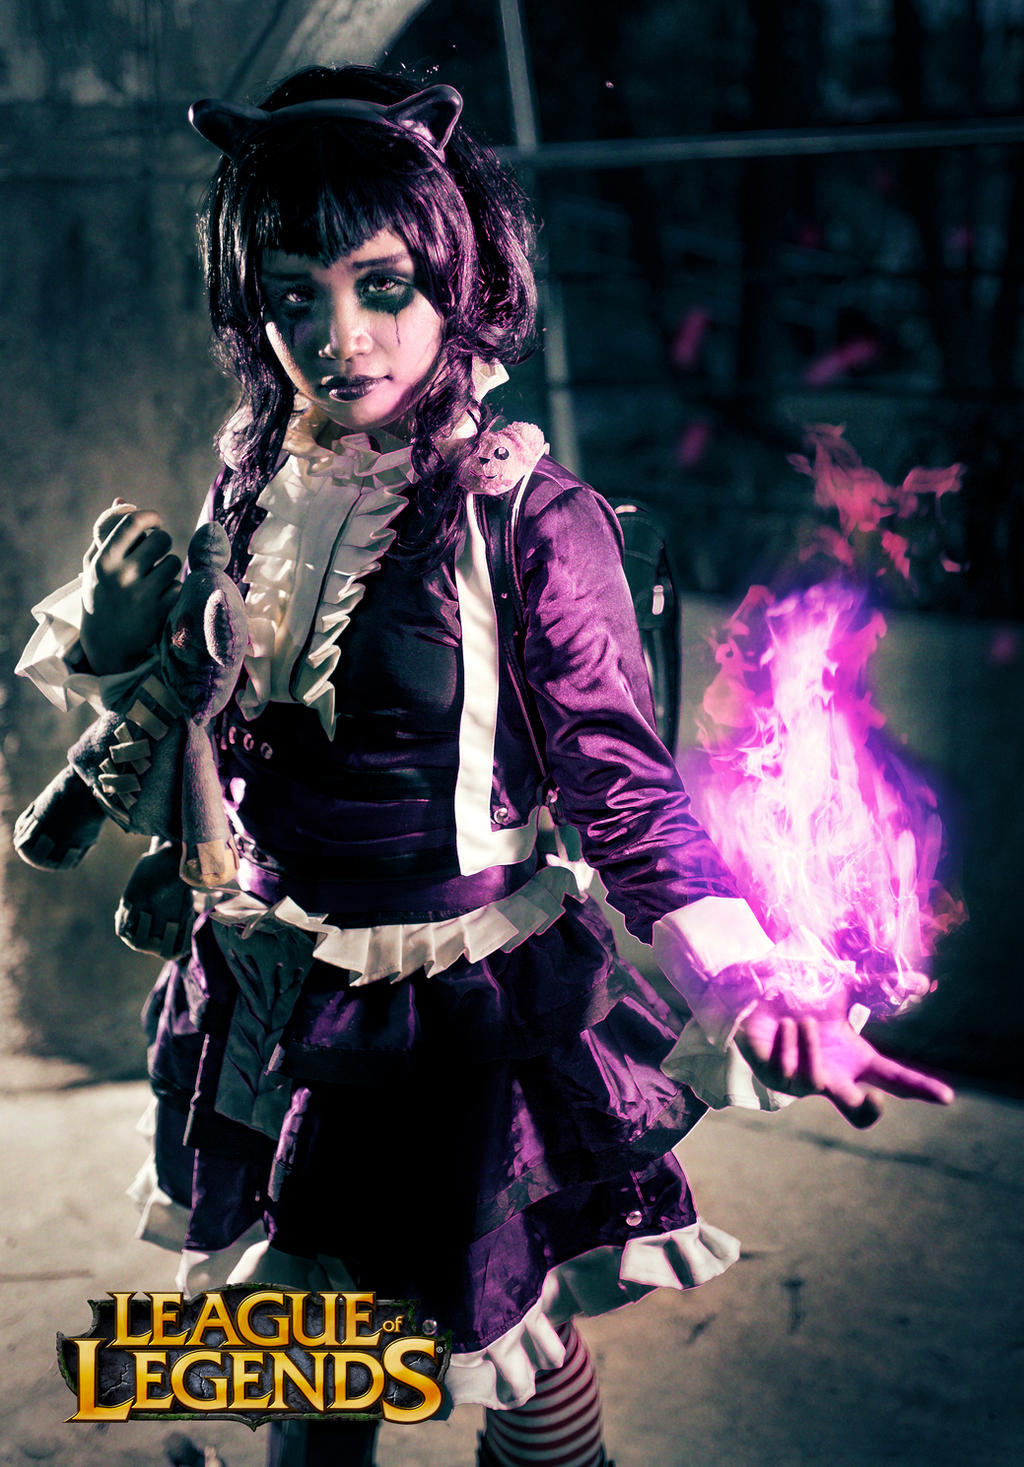 Goth Annie League of Legends by johann29